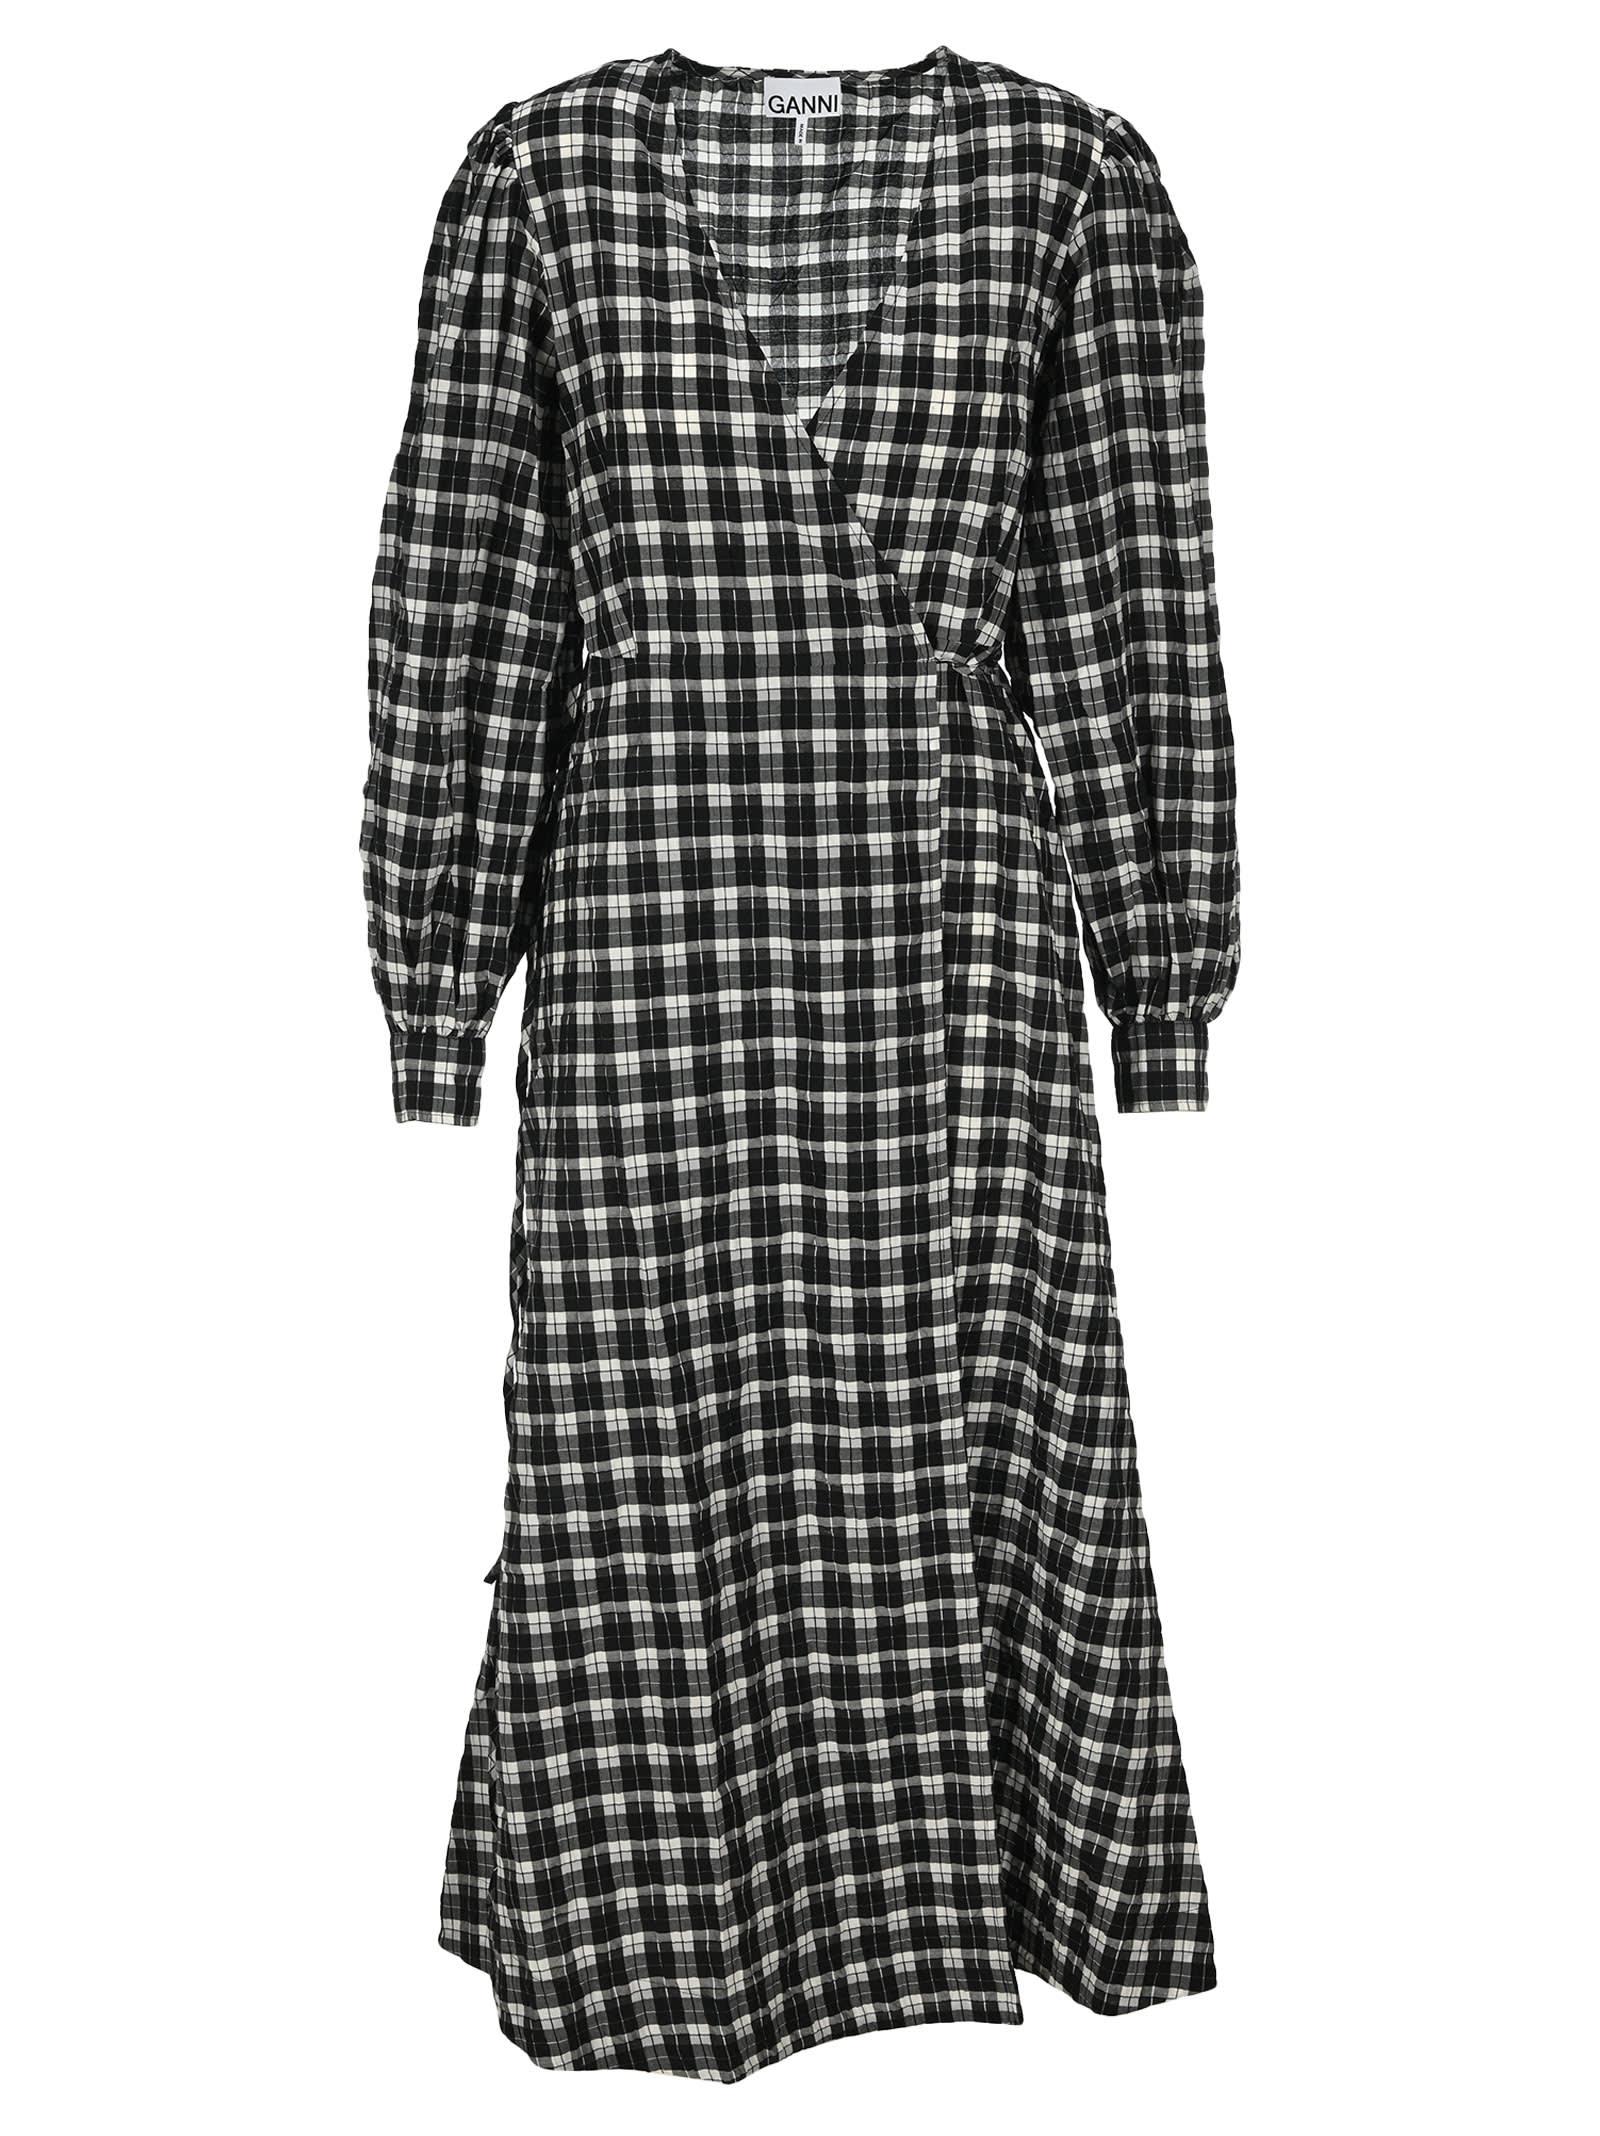 Buy Ganni Check Print Maxi Dress online, shop Ganni with free shipping